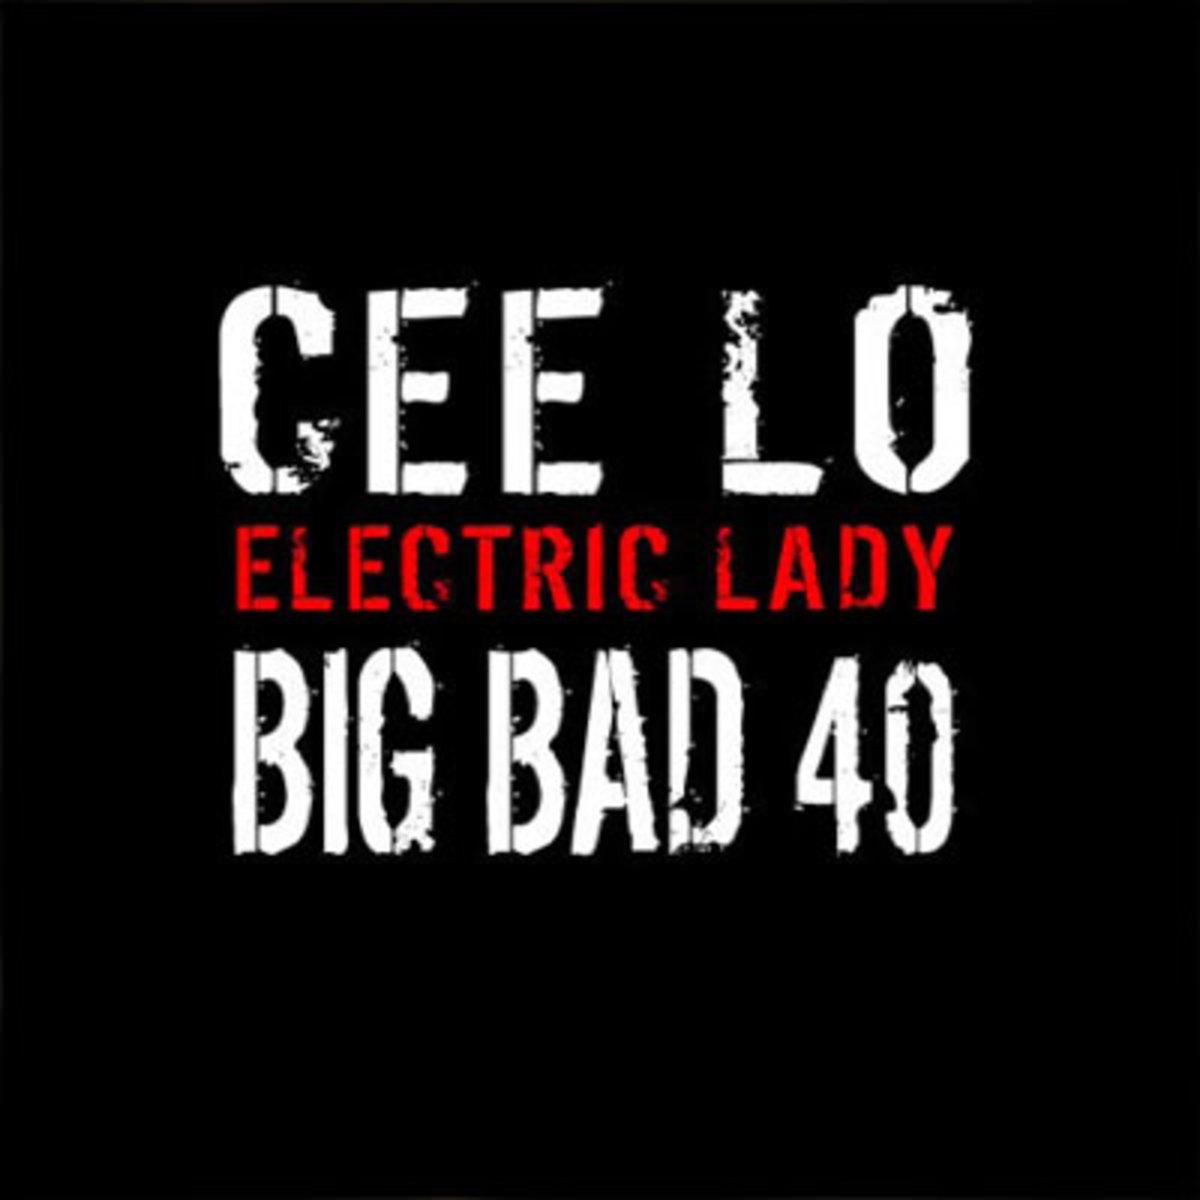 bigbad40-electriclady.jpg